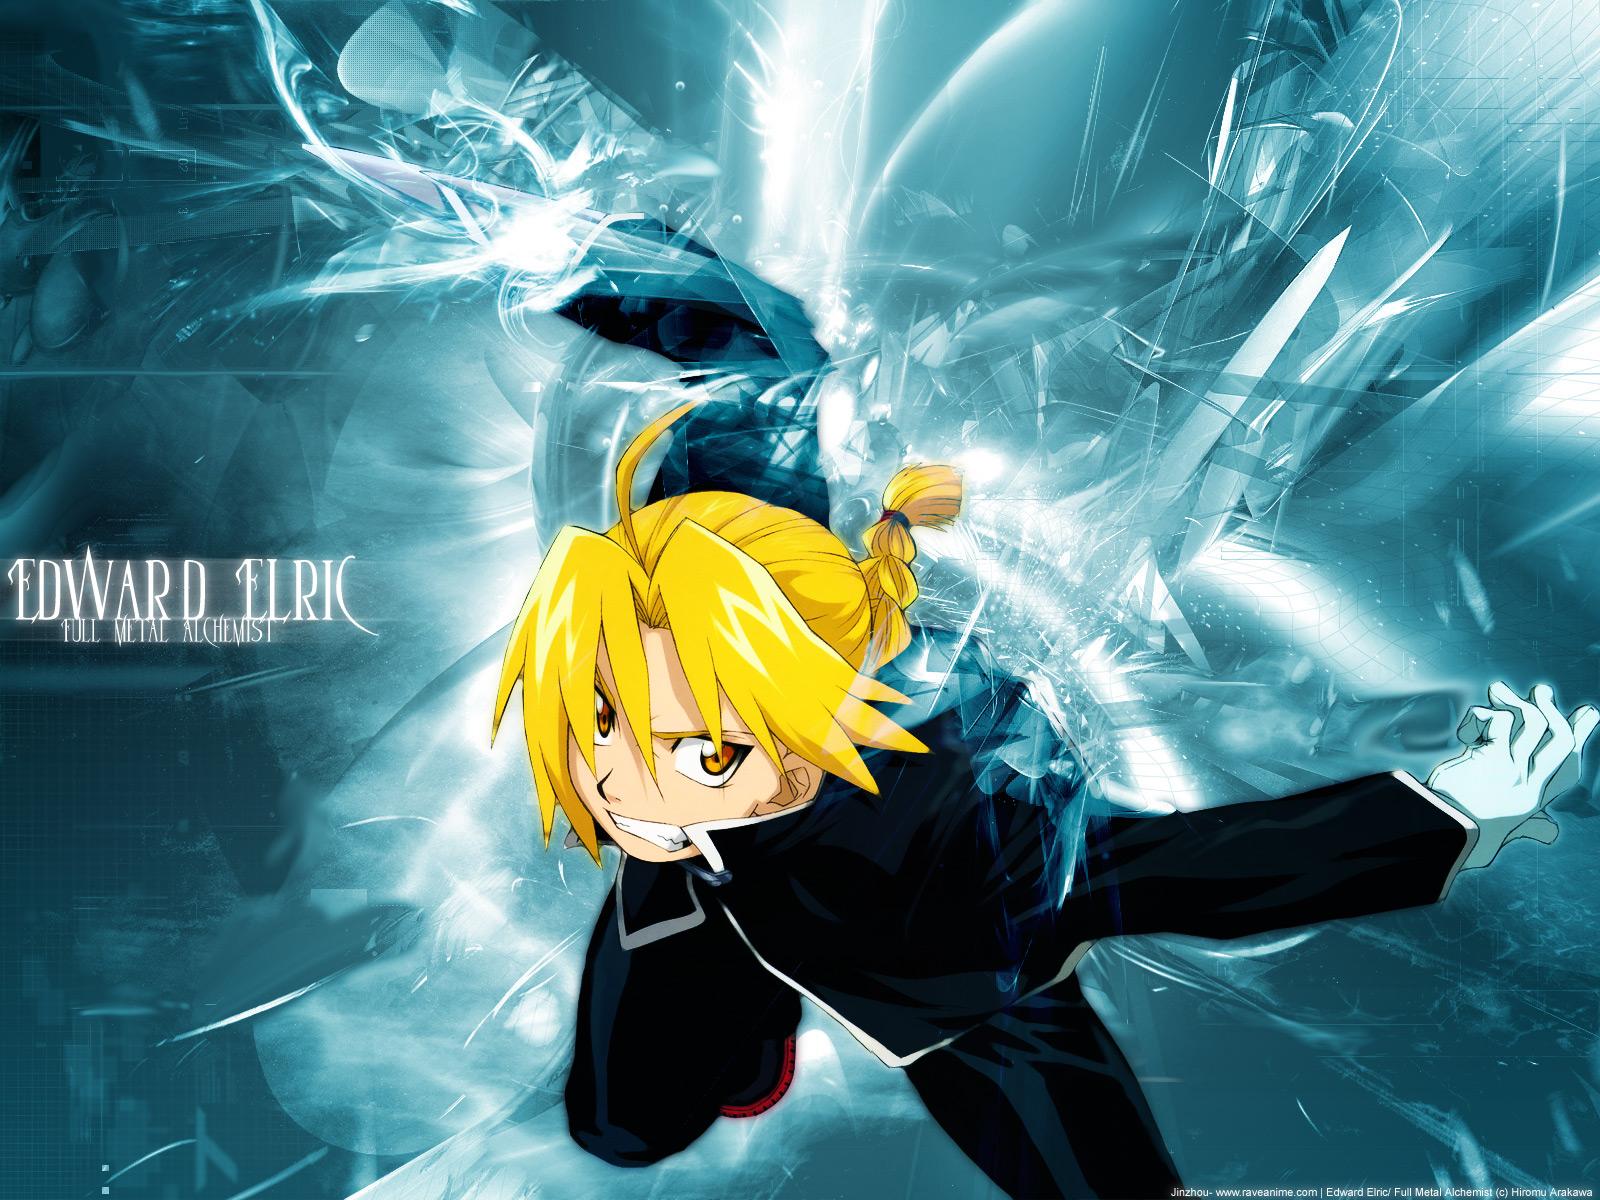 Anime Edward Elric Fullmetal Alchemist   Full HD Desktop Wallpaper 1600x1200